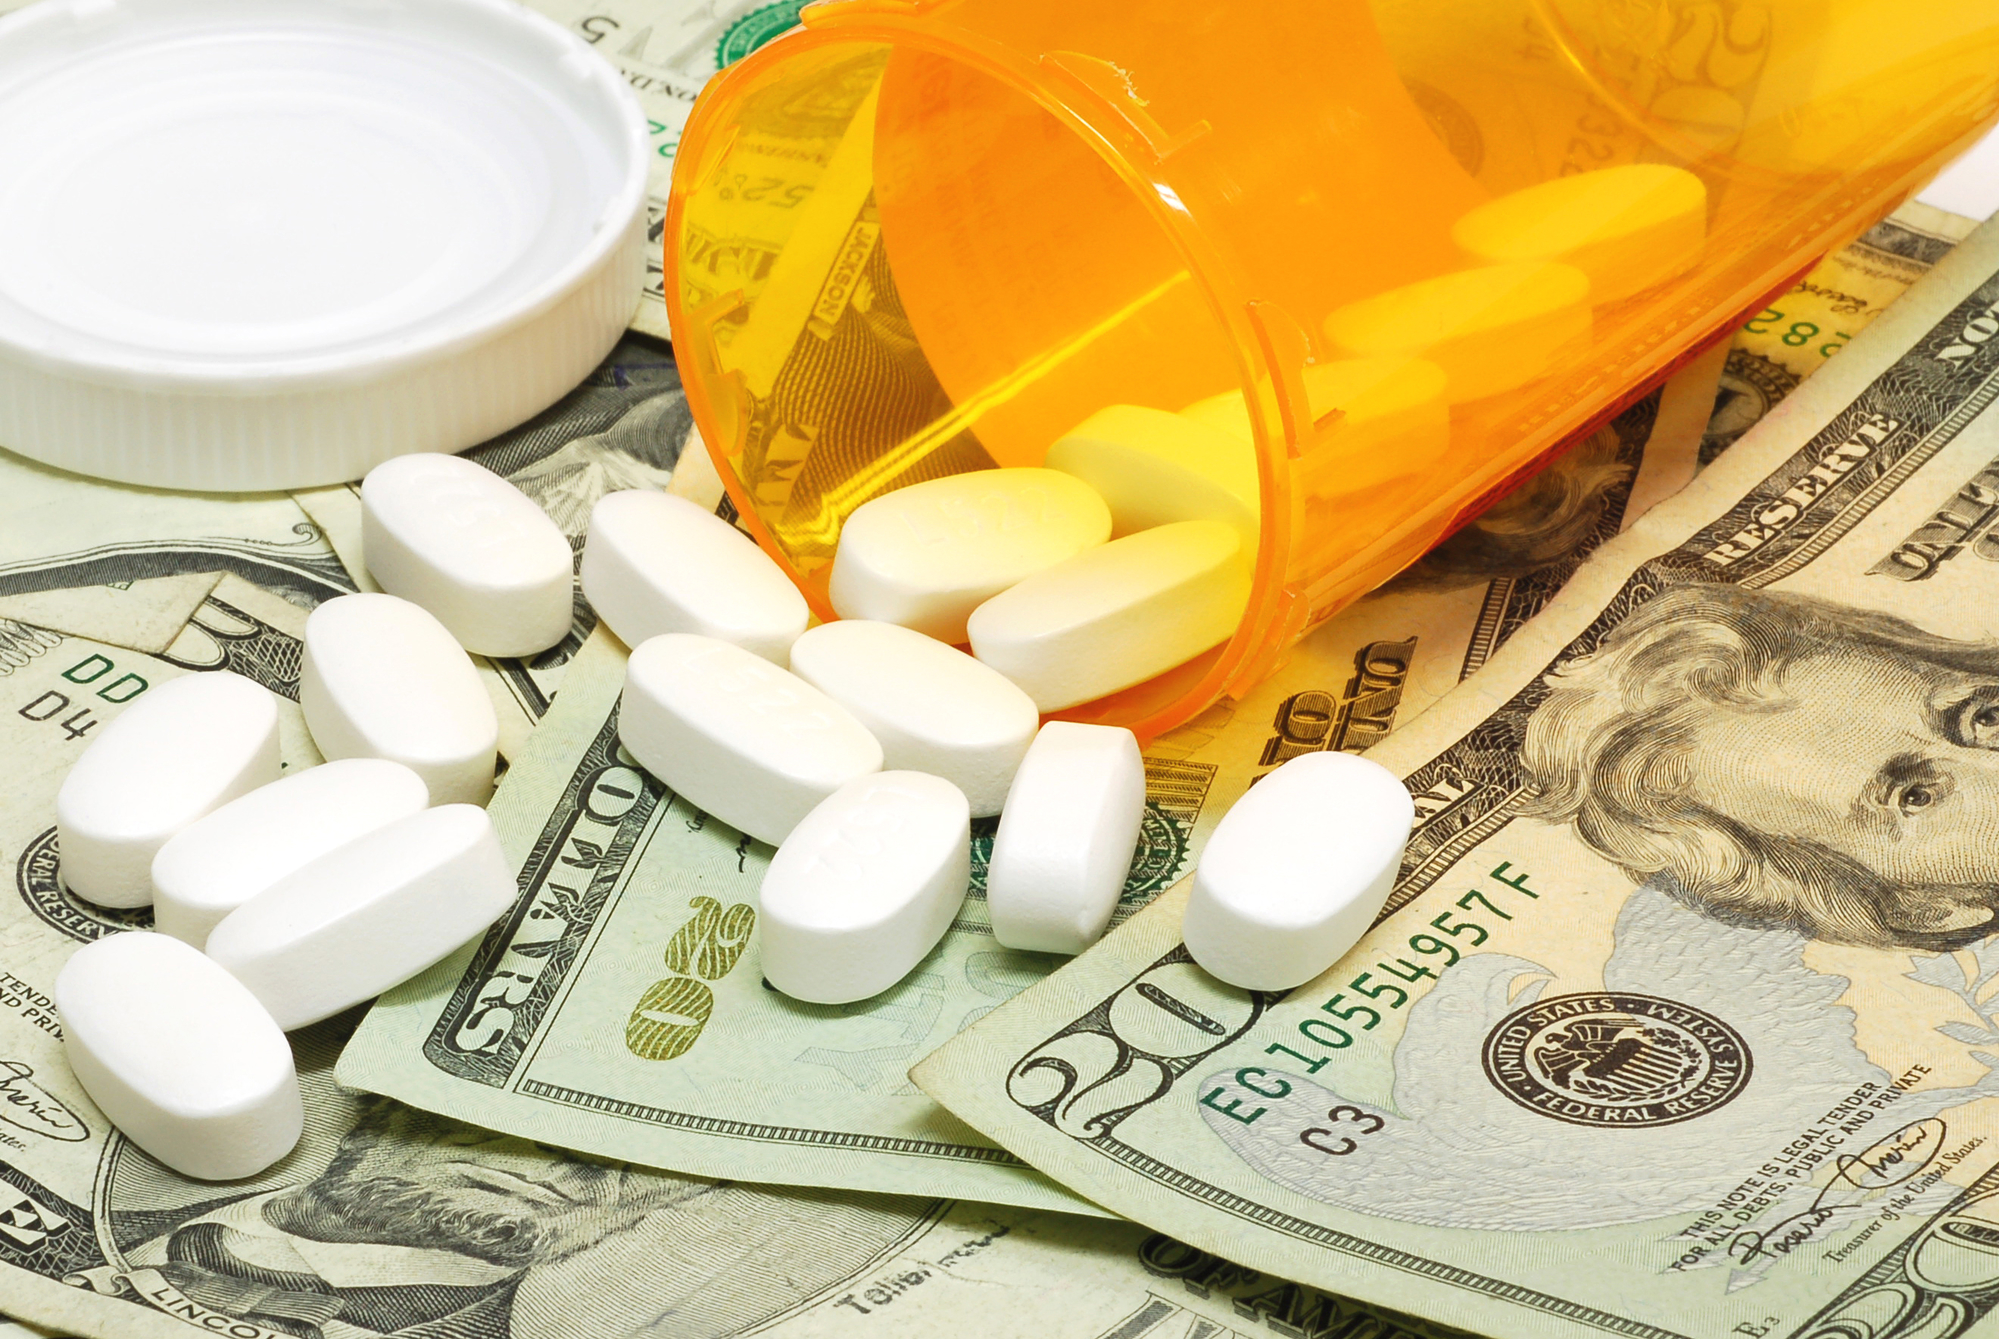 Prescription Drug Fraud